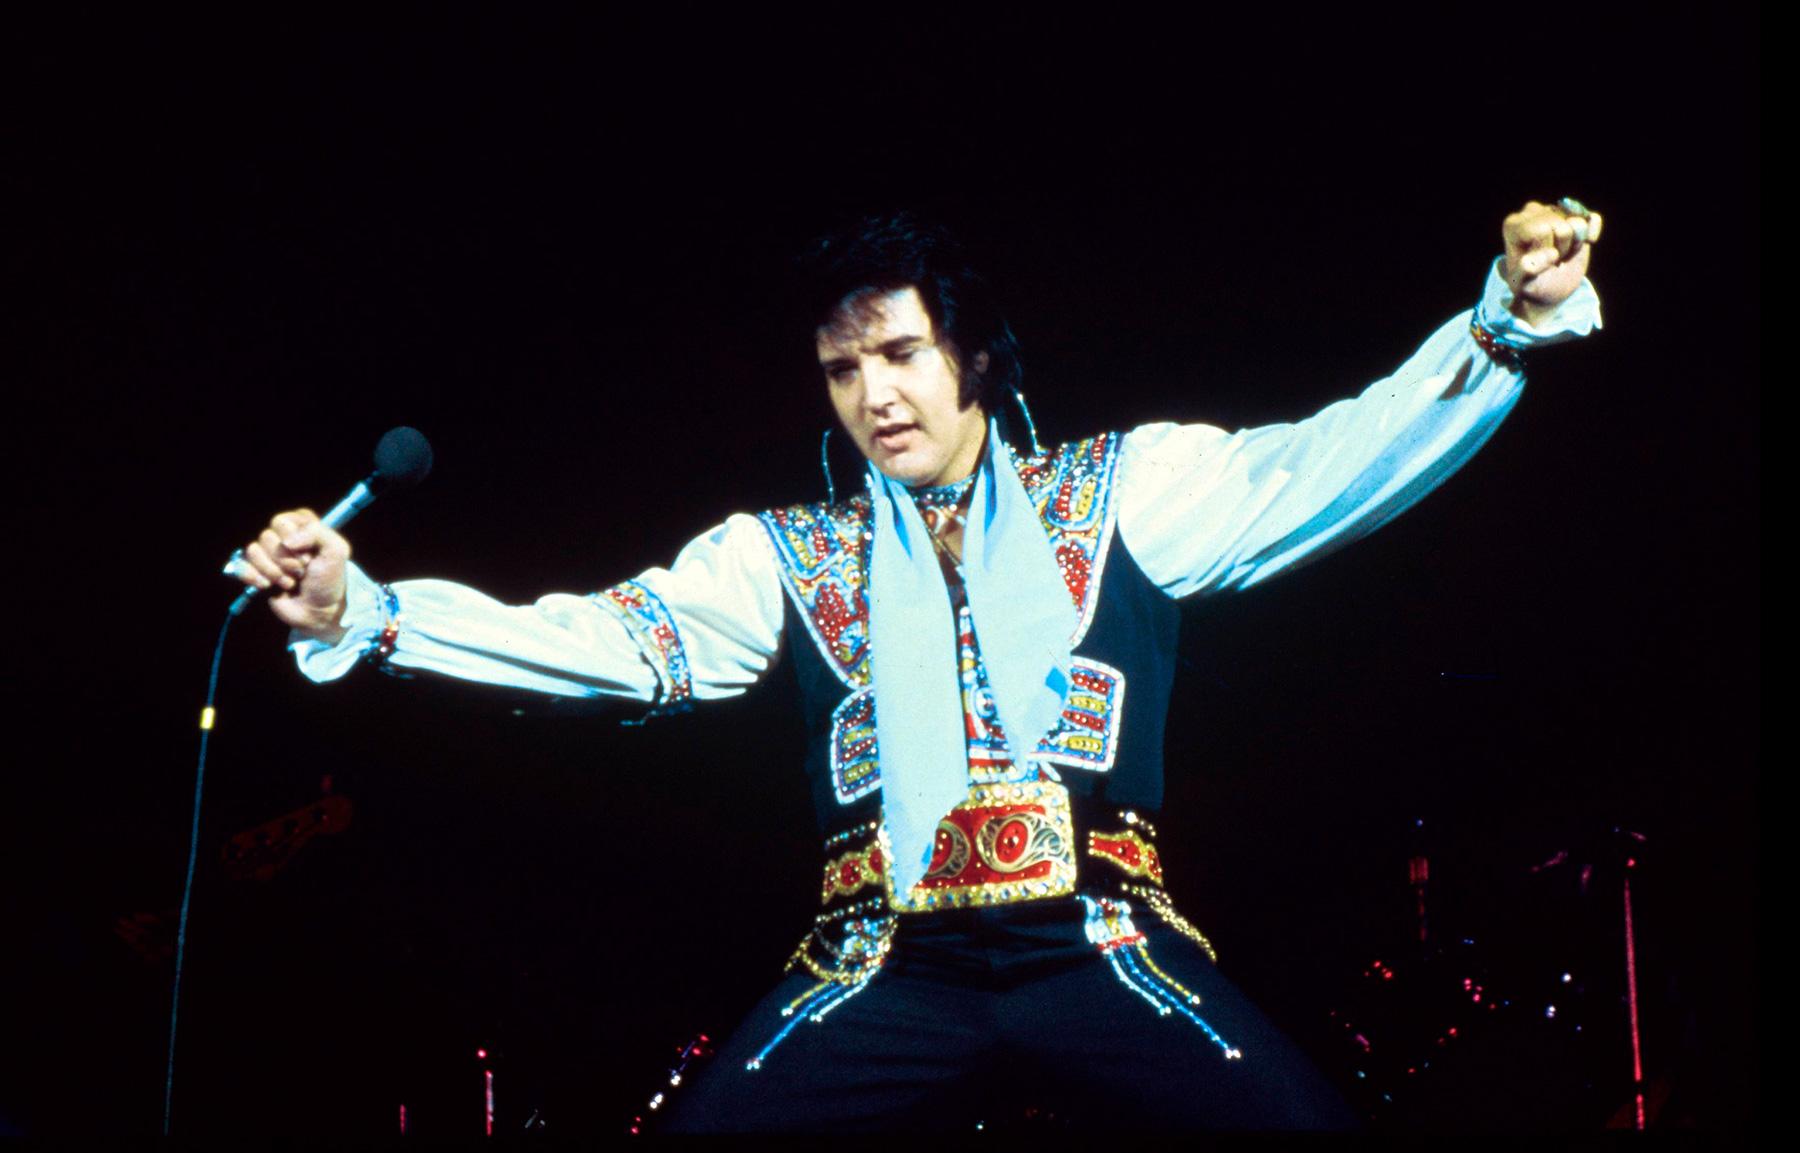 Elvis Presley's Posthumous Popularity Is Plummeting